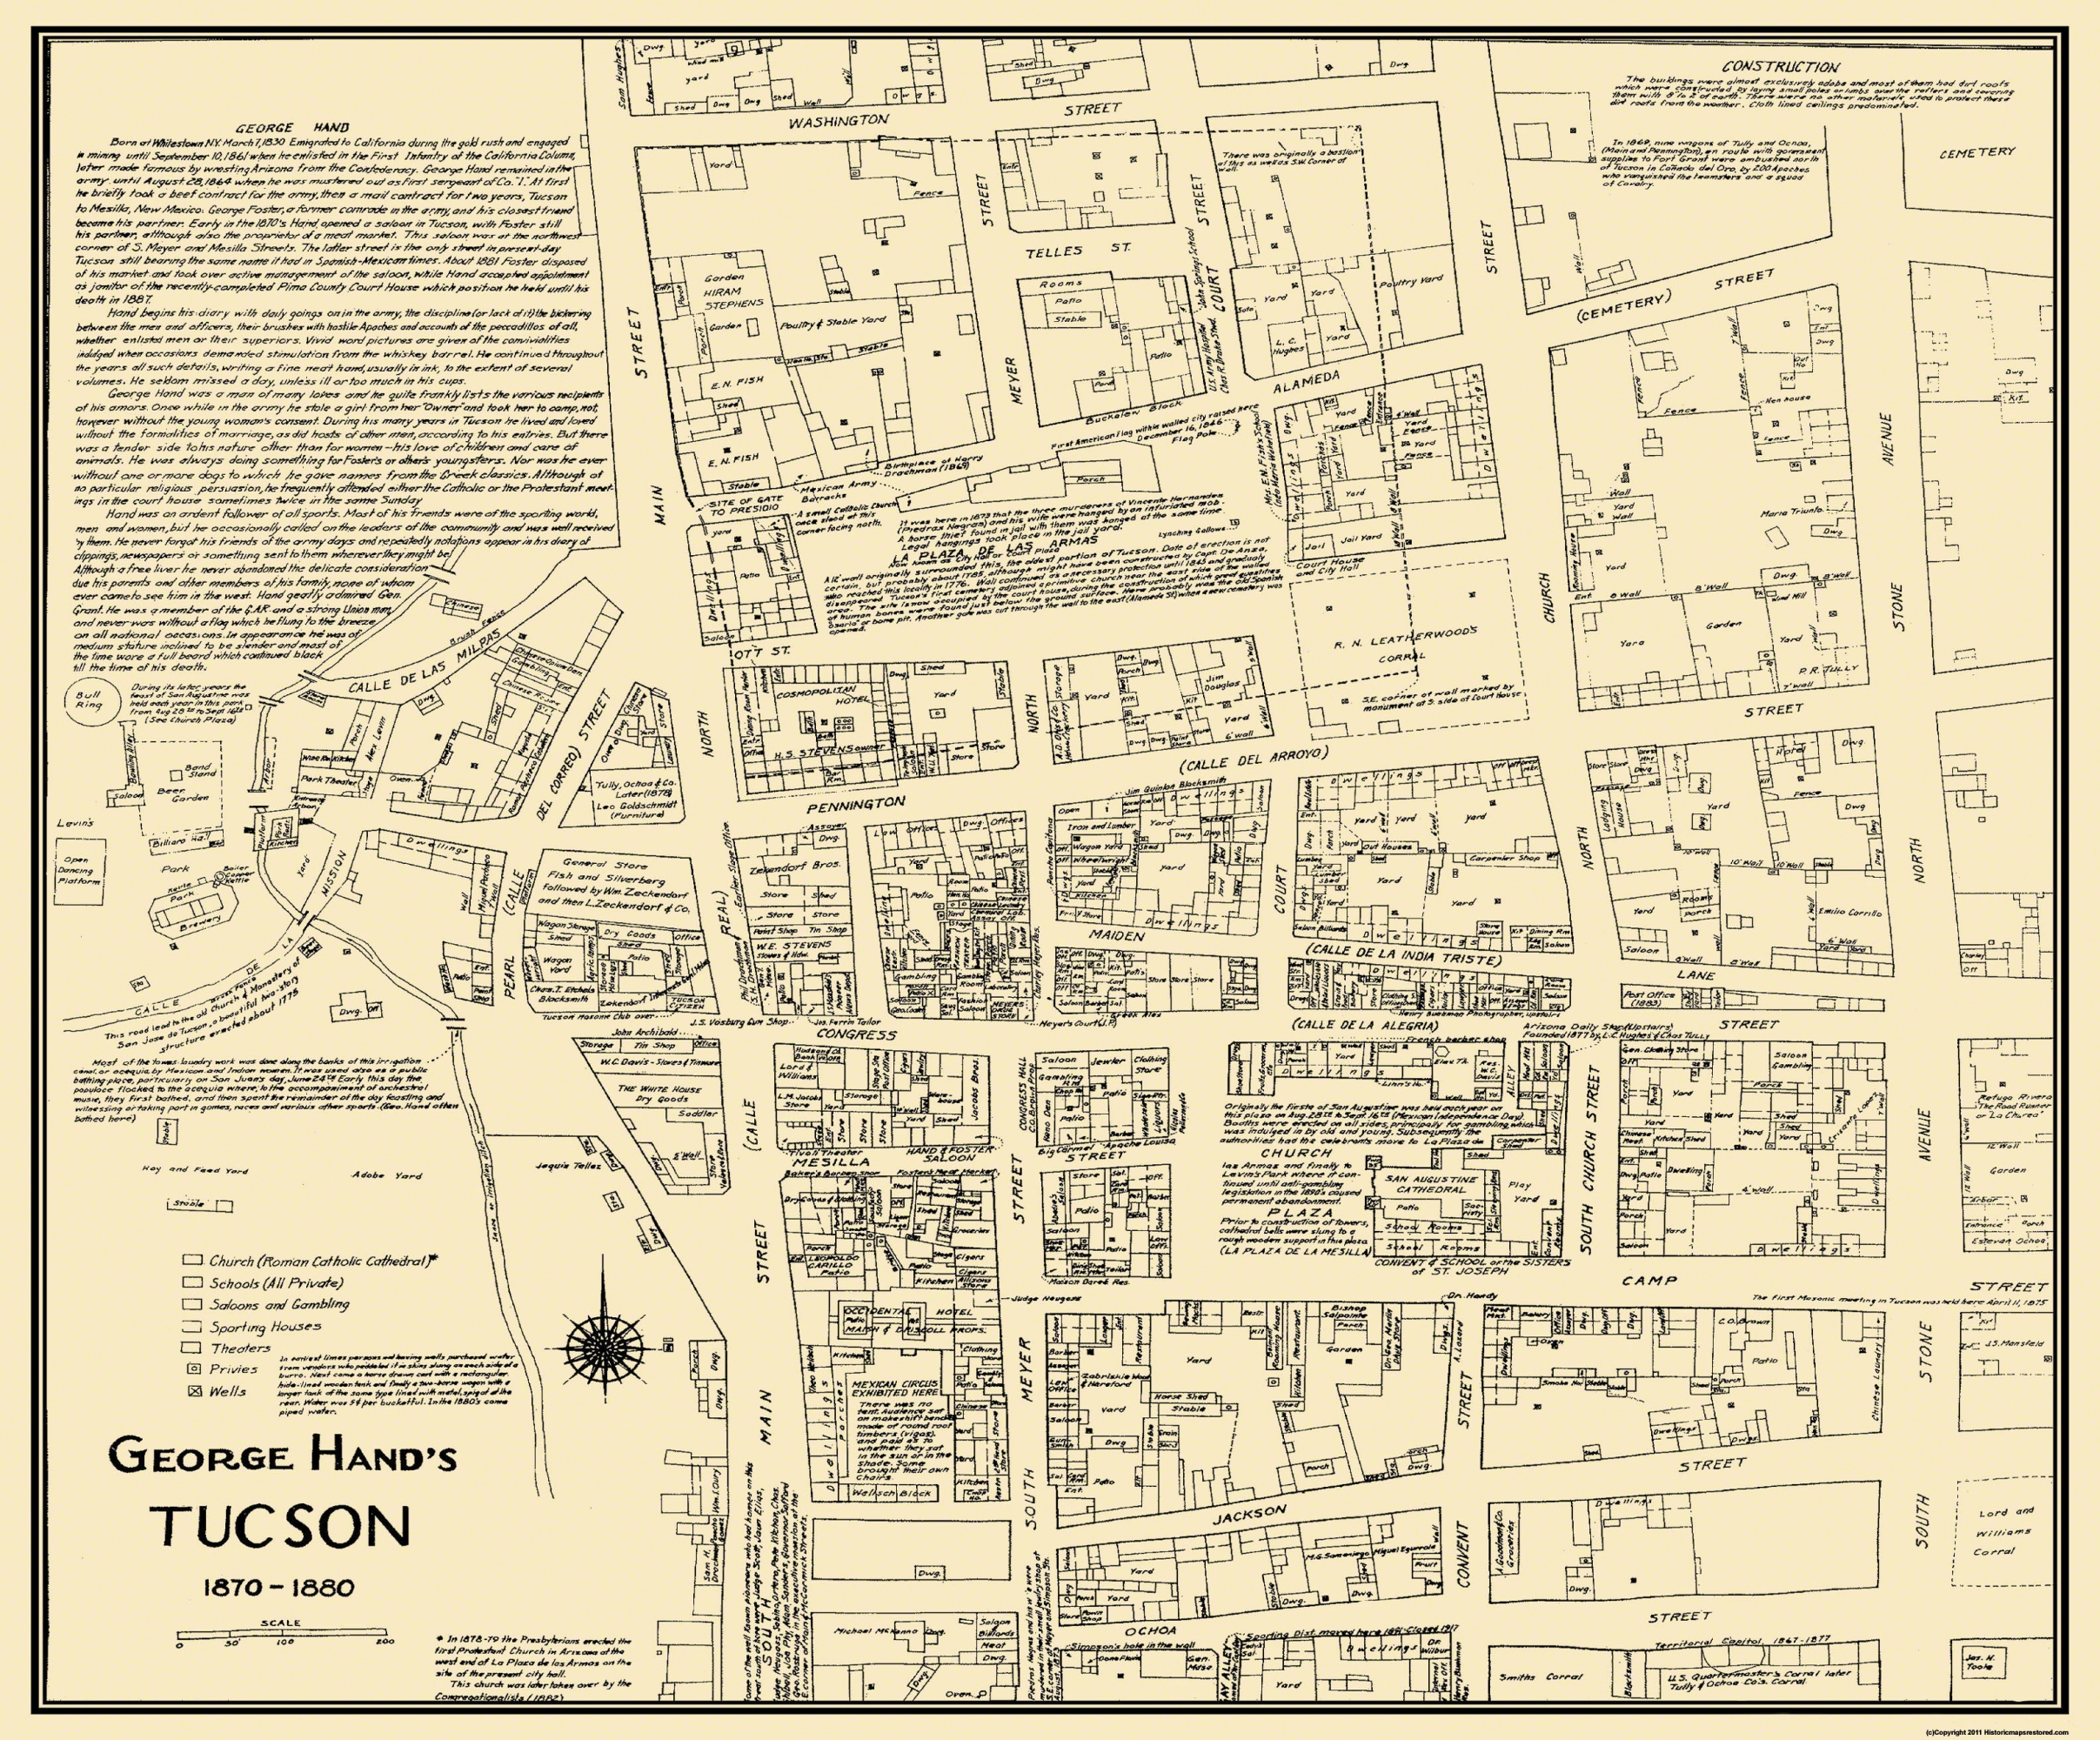 Old City Map - Tucson Arizona Landowner - 1870